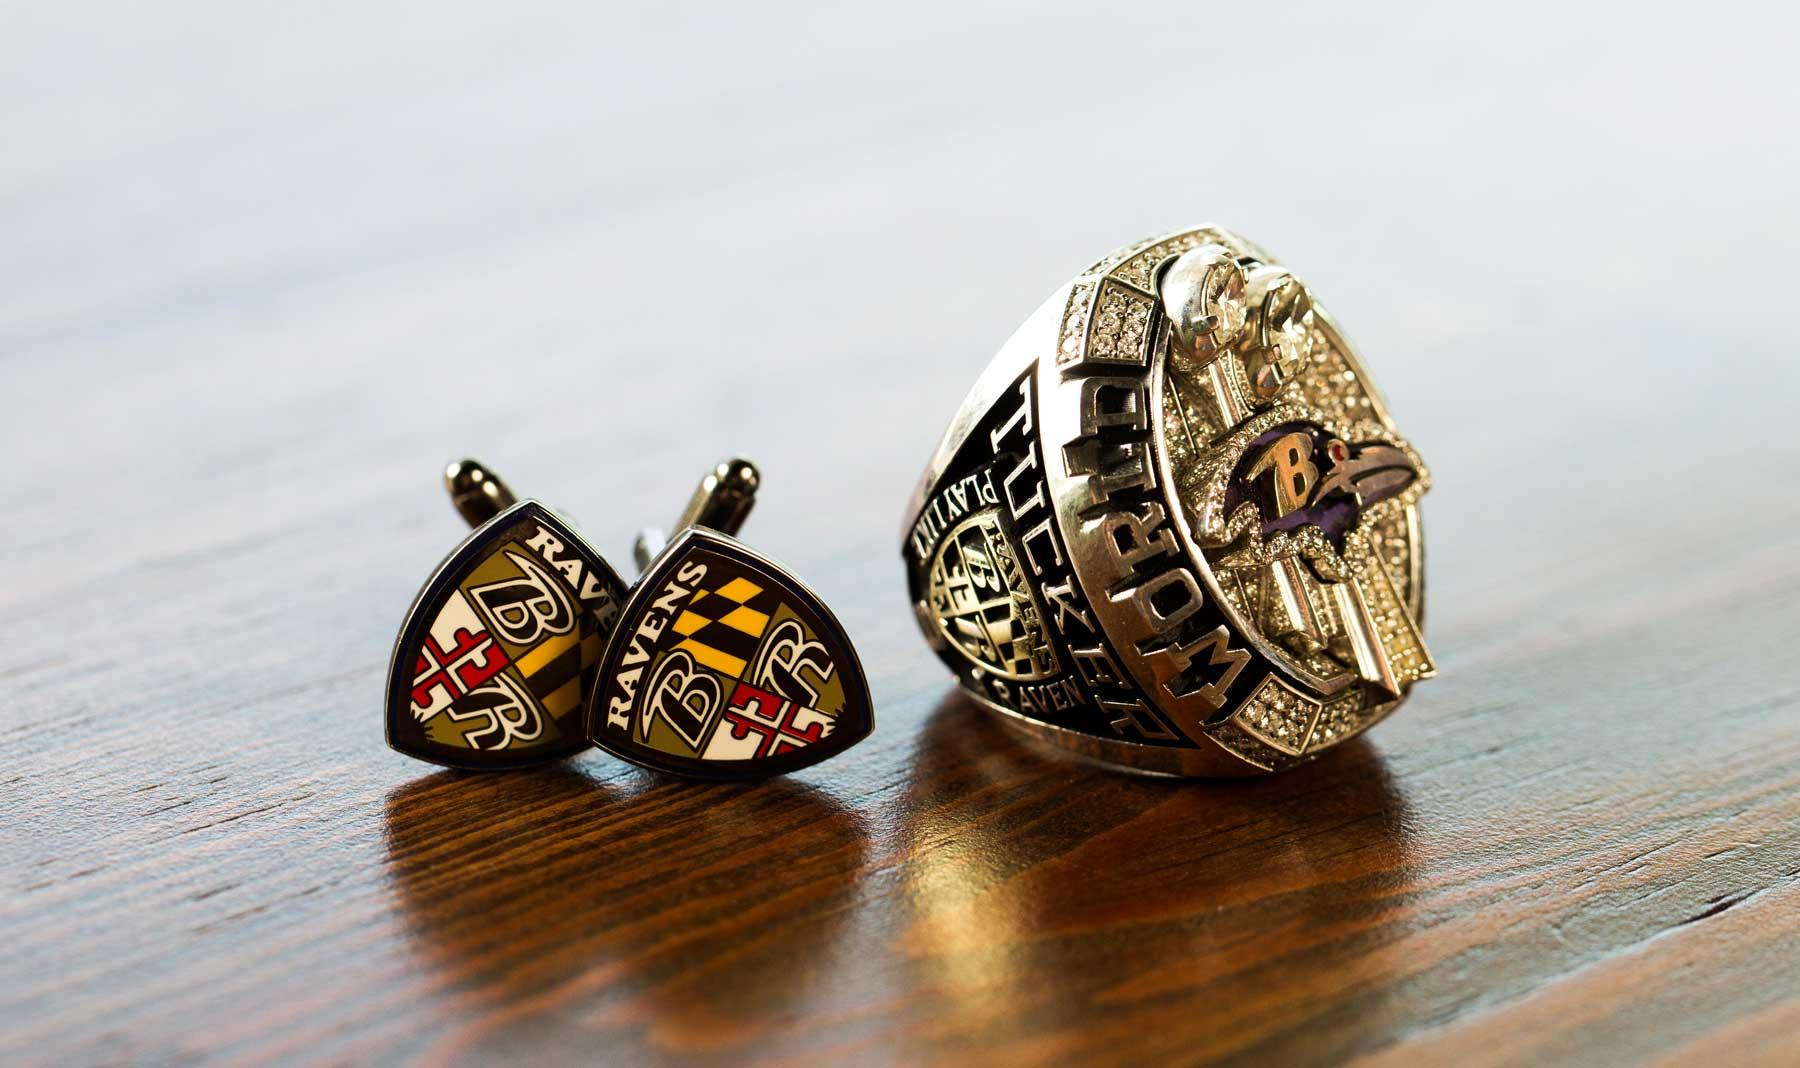 Tucker's 2012 Super Bowl ring